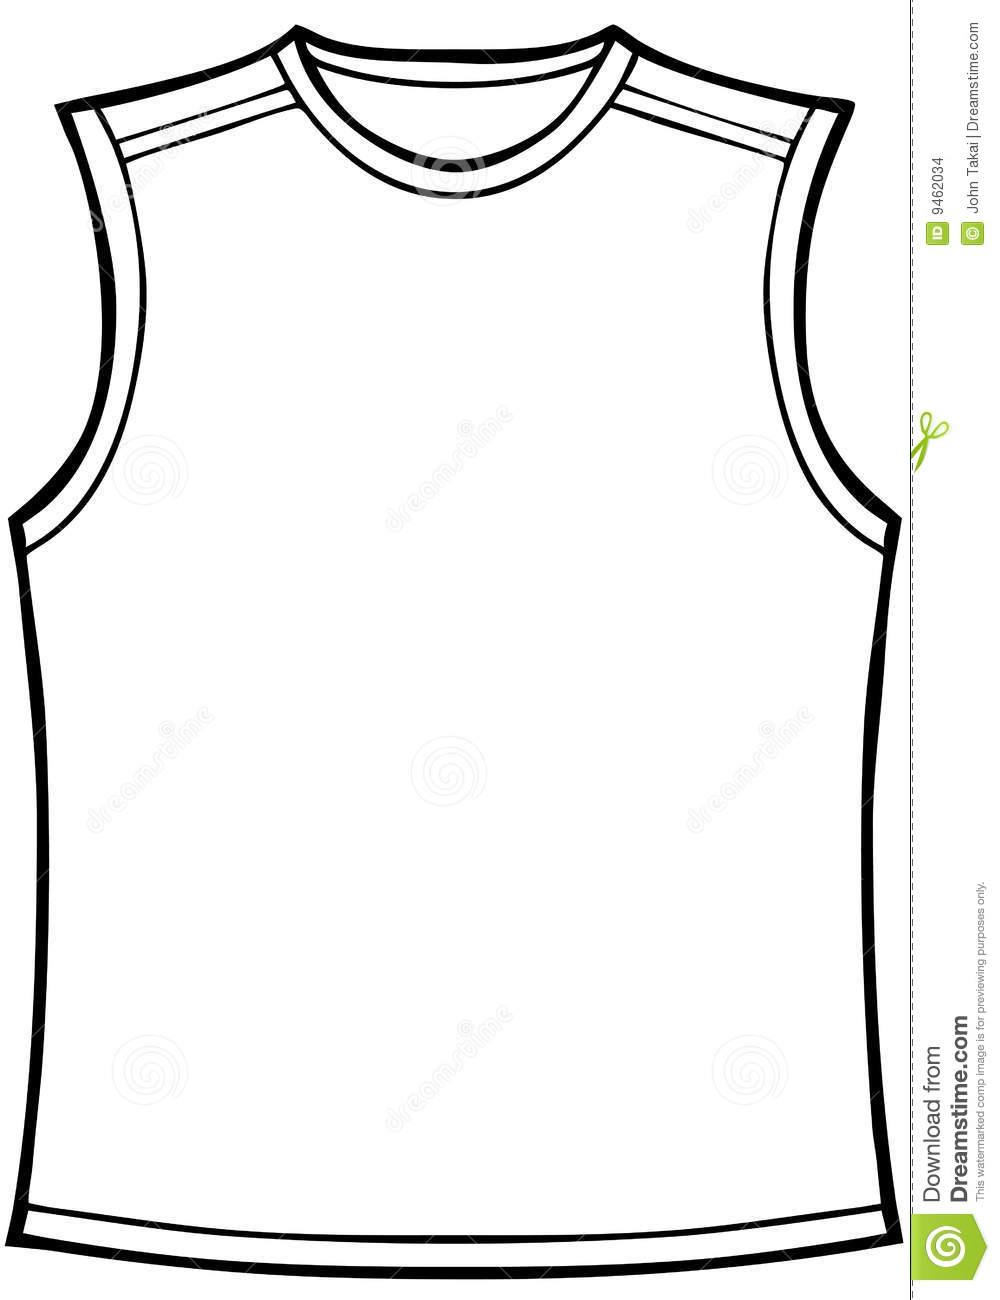 1000x1300 Clip Art Black And White Shirt Clipart